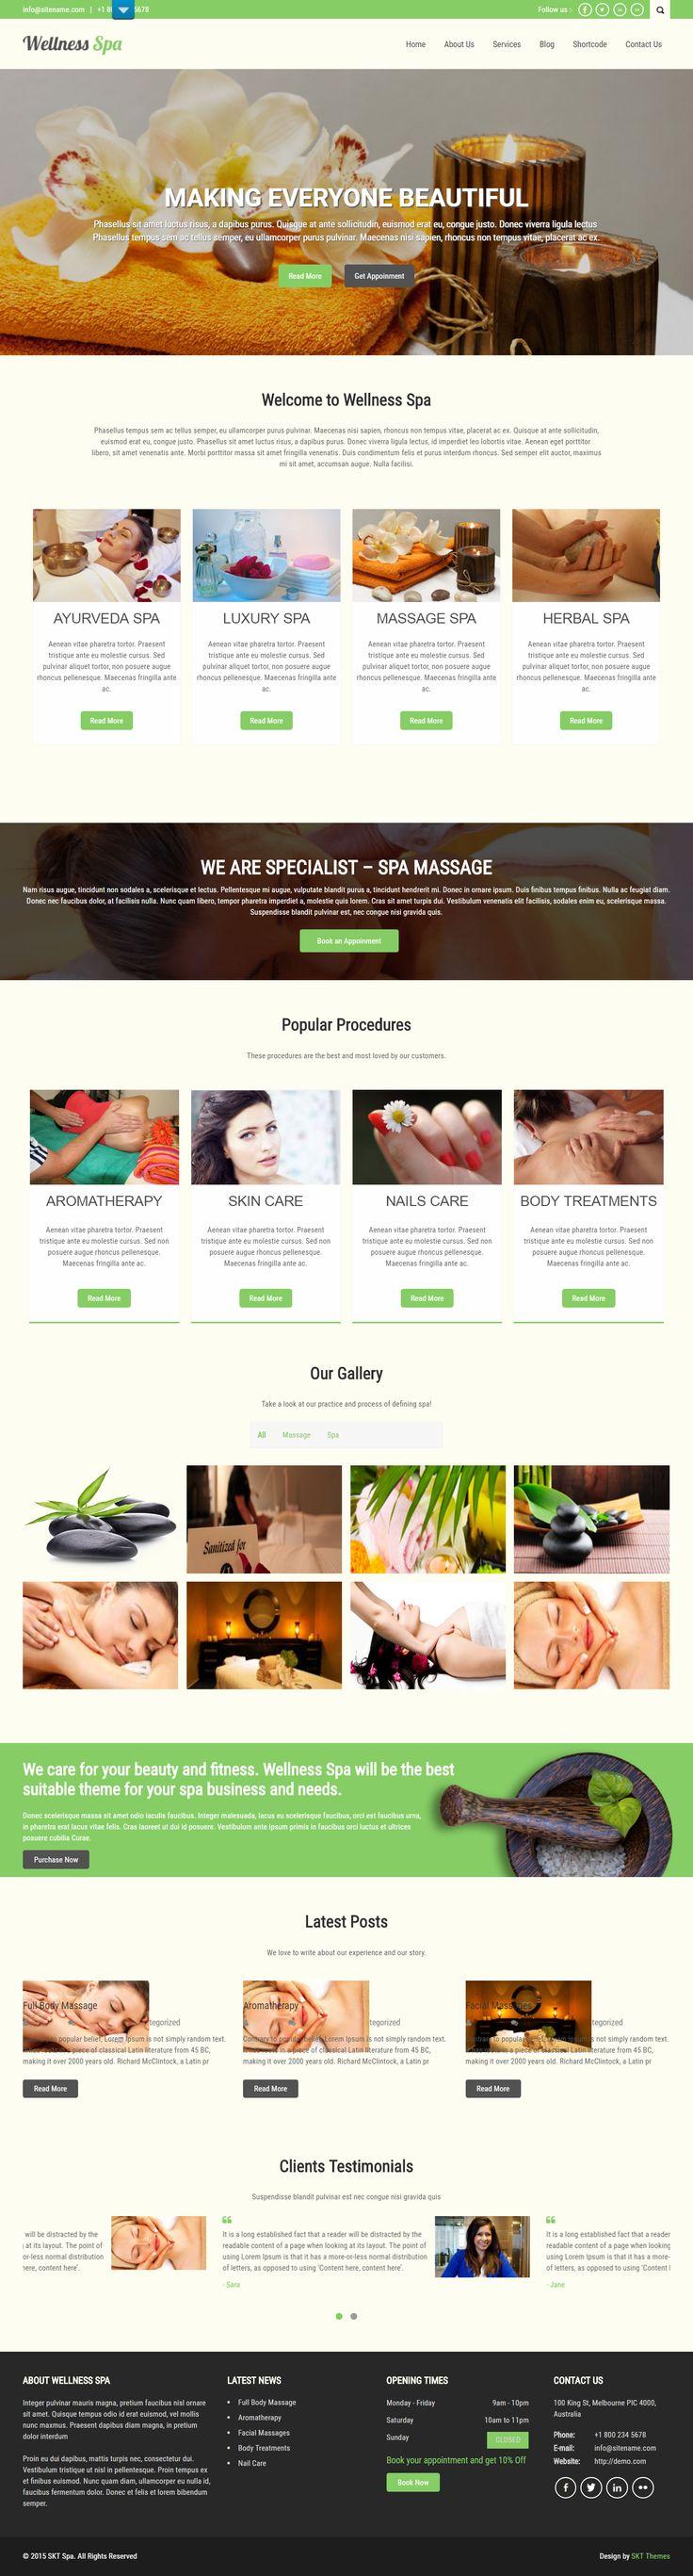 Free Beauty Spa WordPress Theme for Spas and Salon Websites